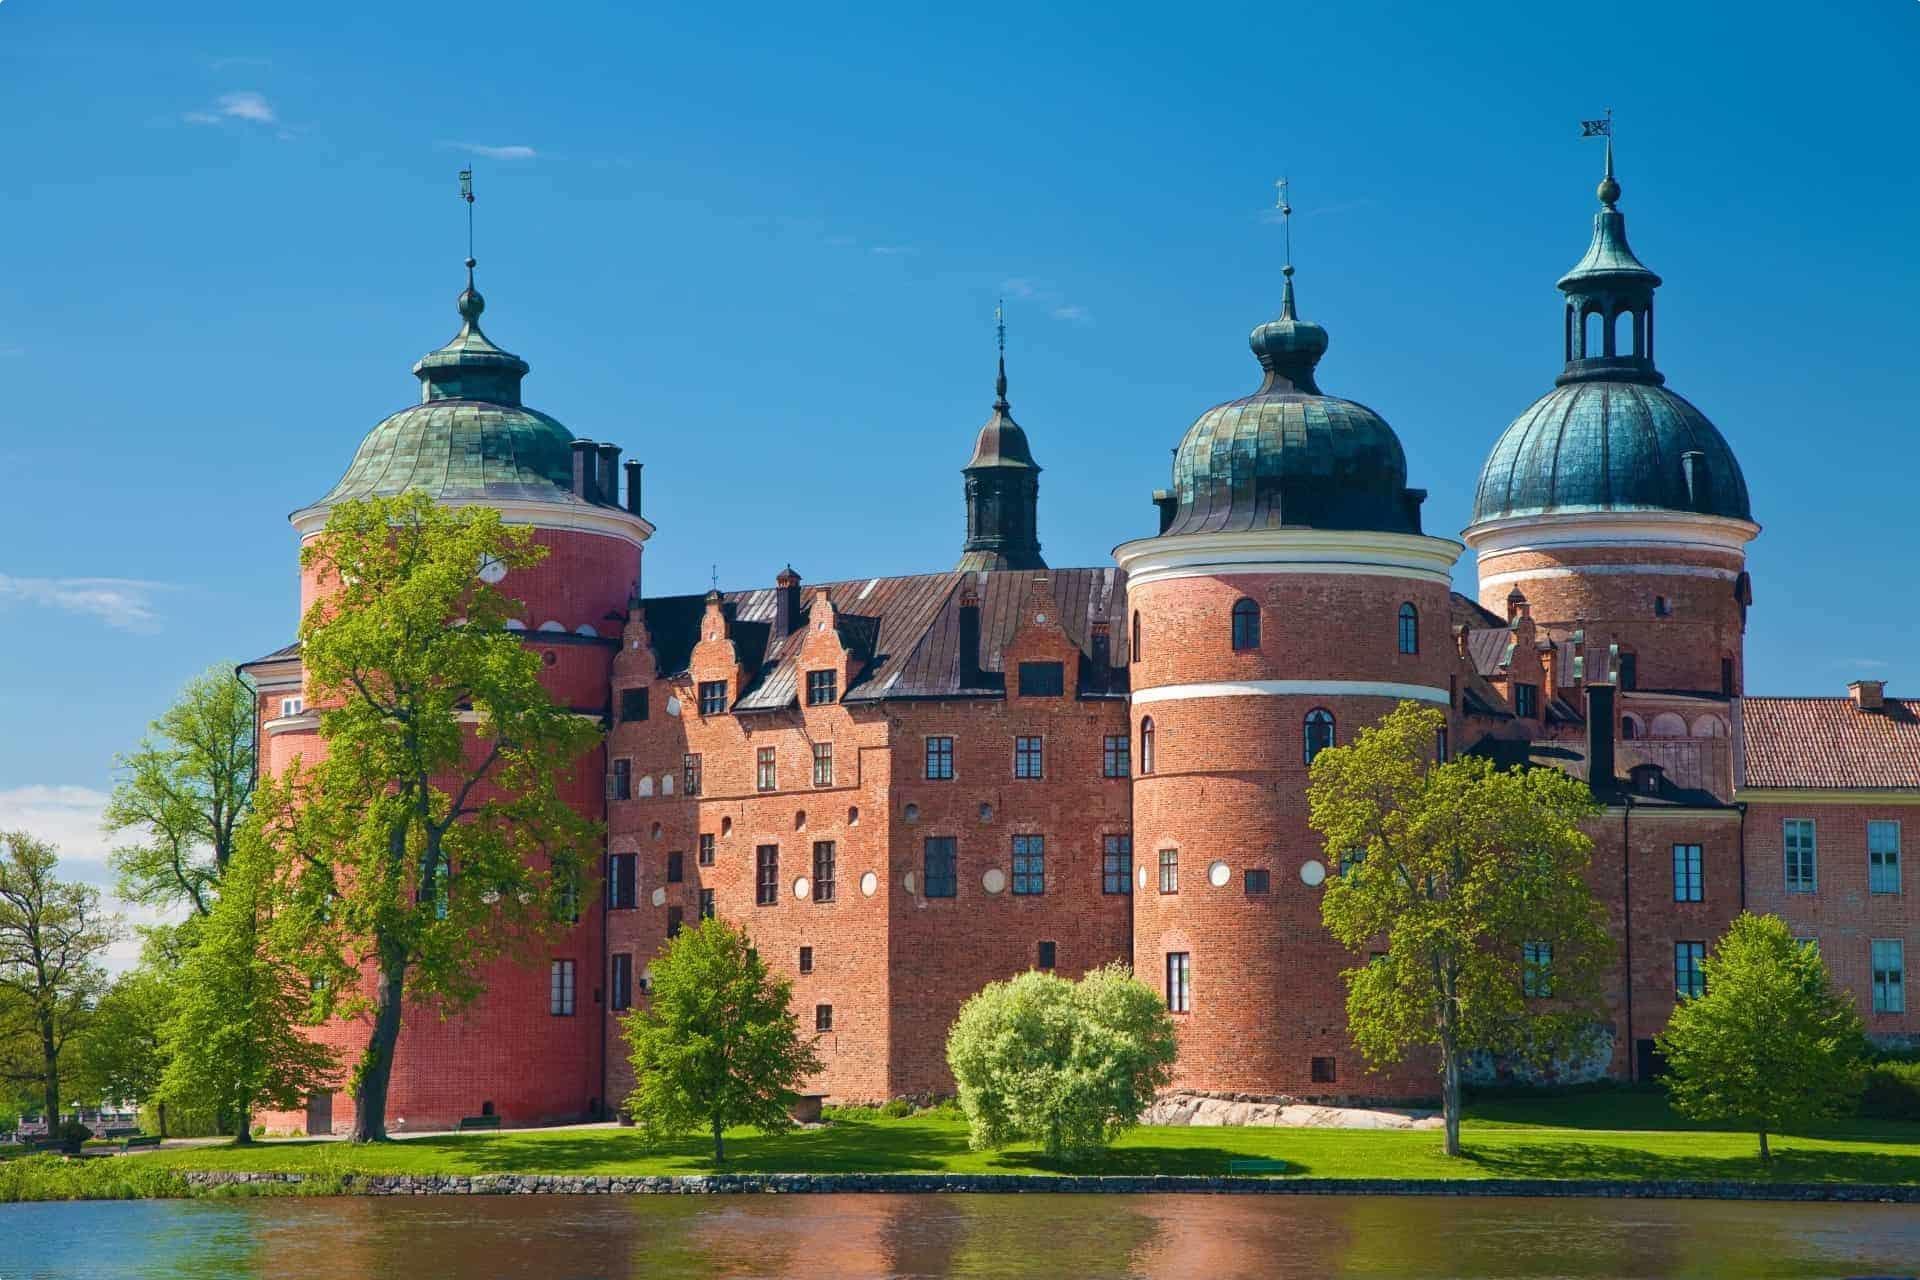 Swedish history tours